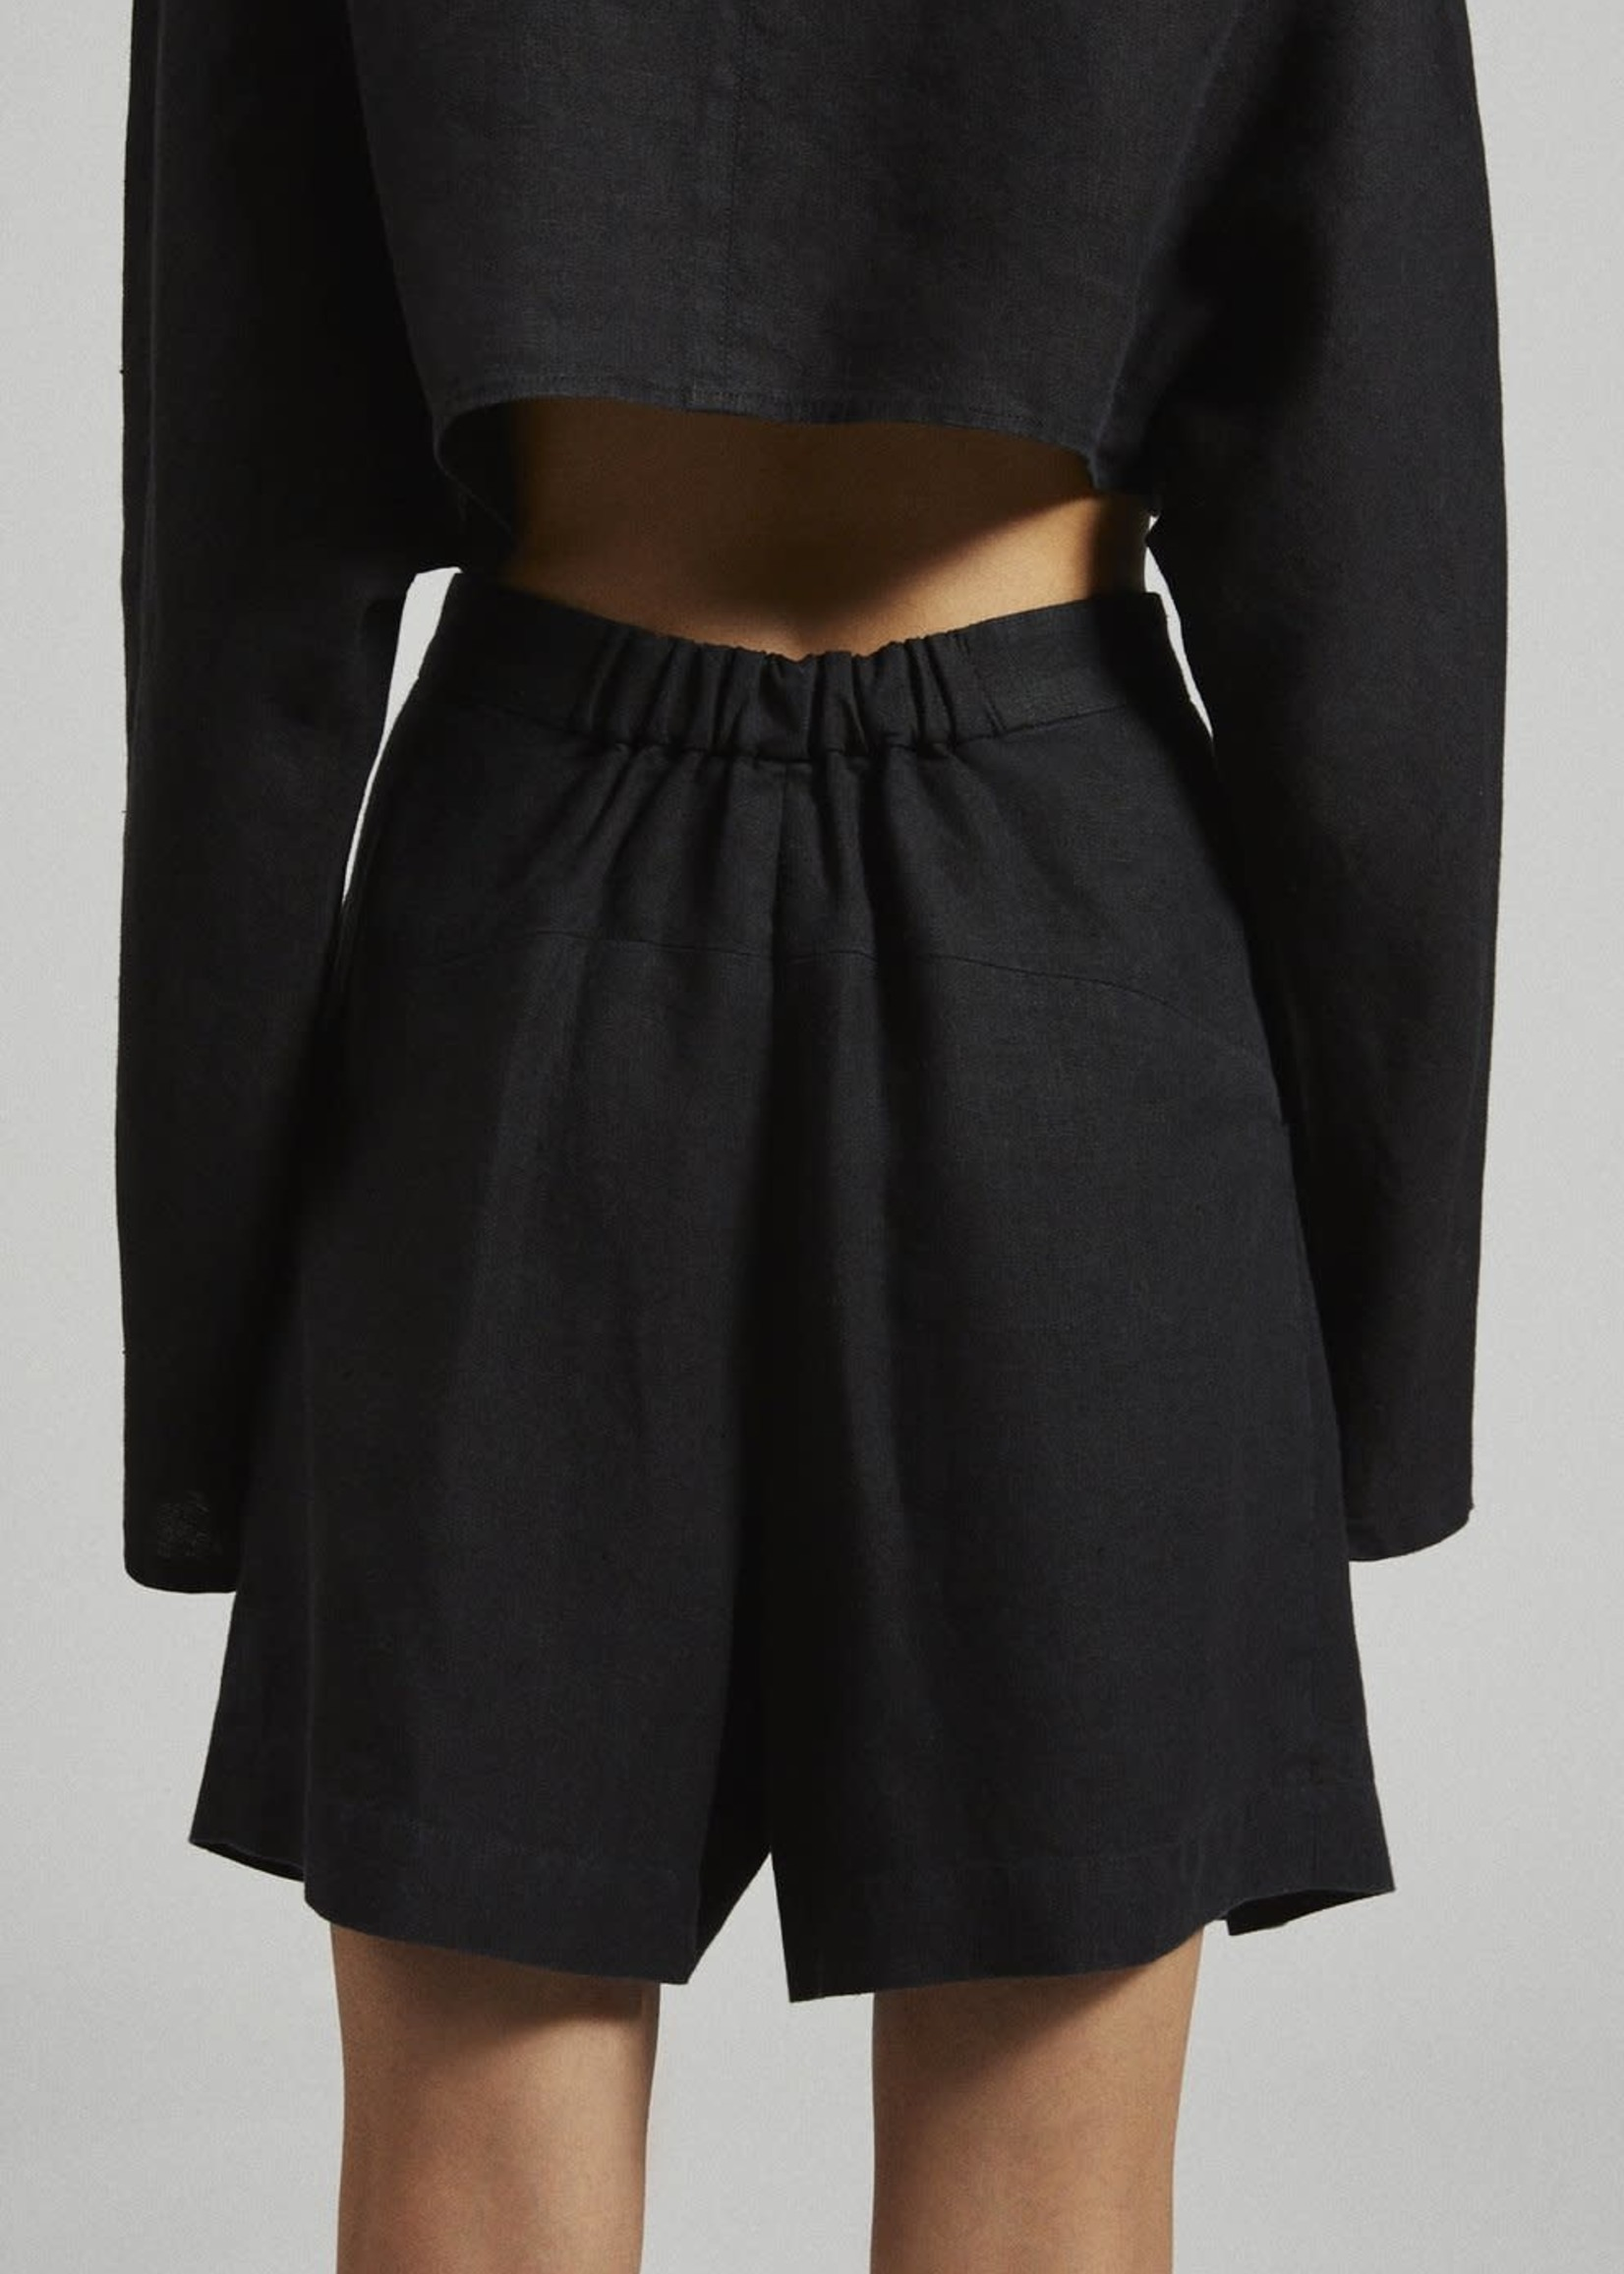 Rachel Comey Bandini Linen Shorts in Black